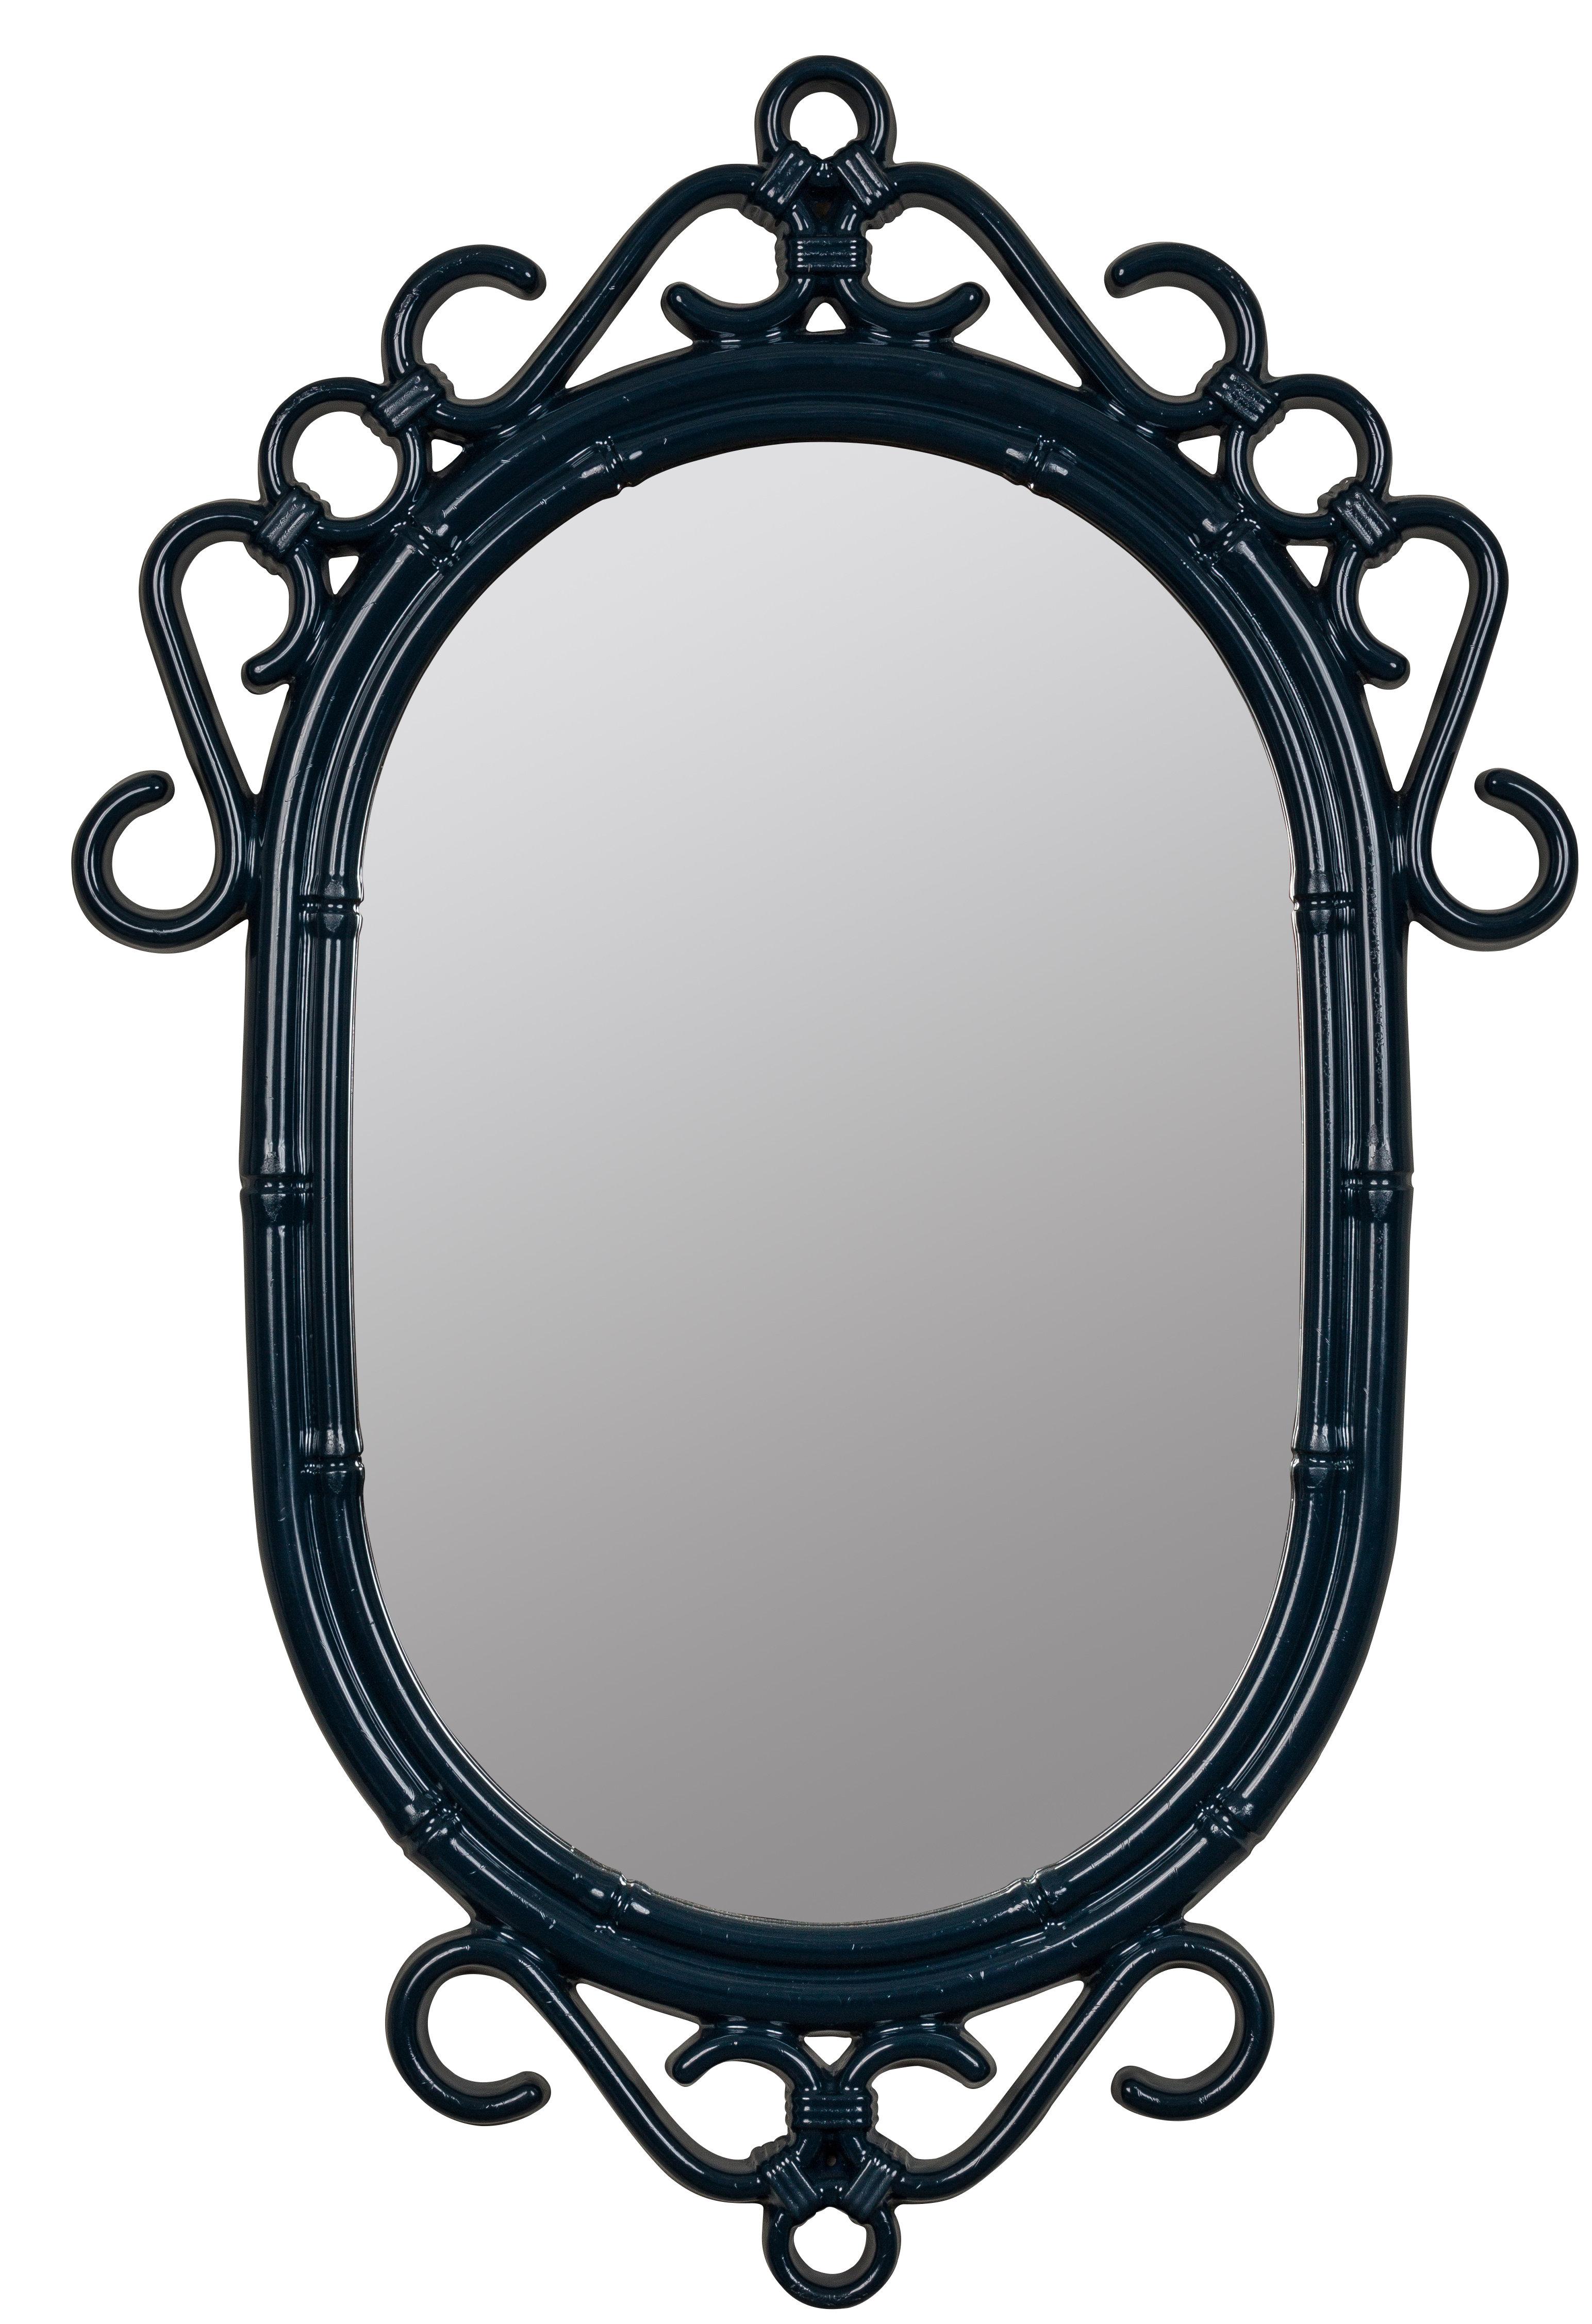 Accent Wall Mirrors | Joss & Main Regarding Gaunts Earthcott Modern & Contemporary Beveled Accent Mirrors (Image 2 of 20)